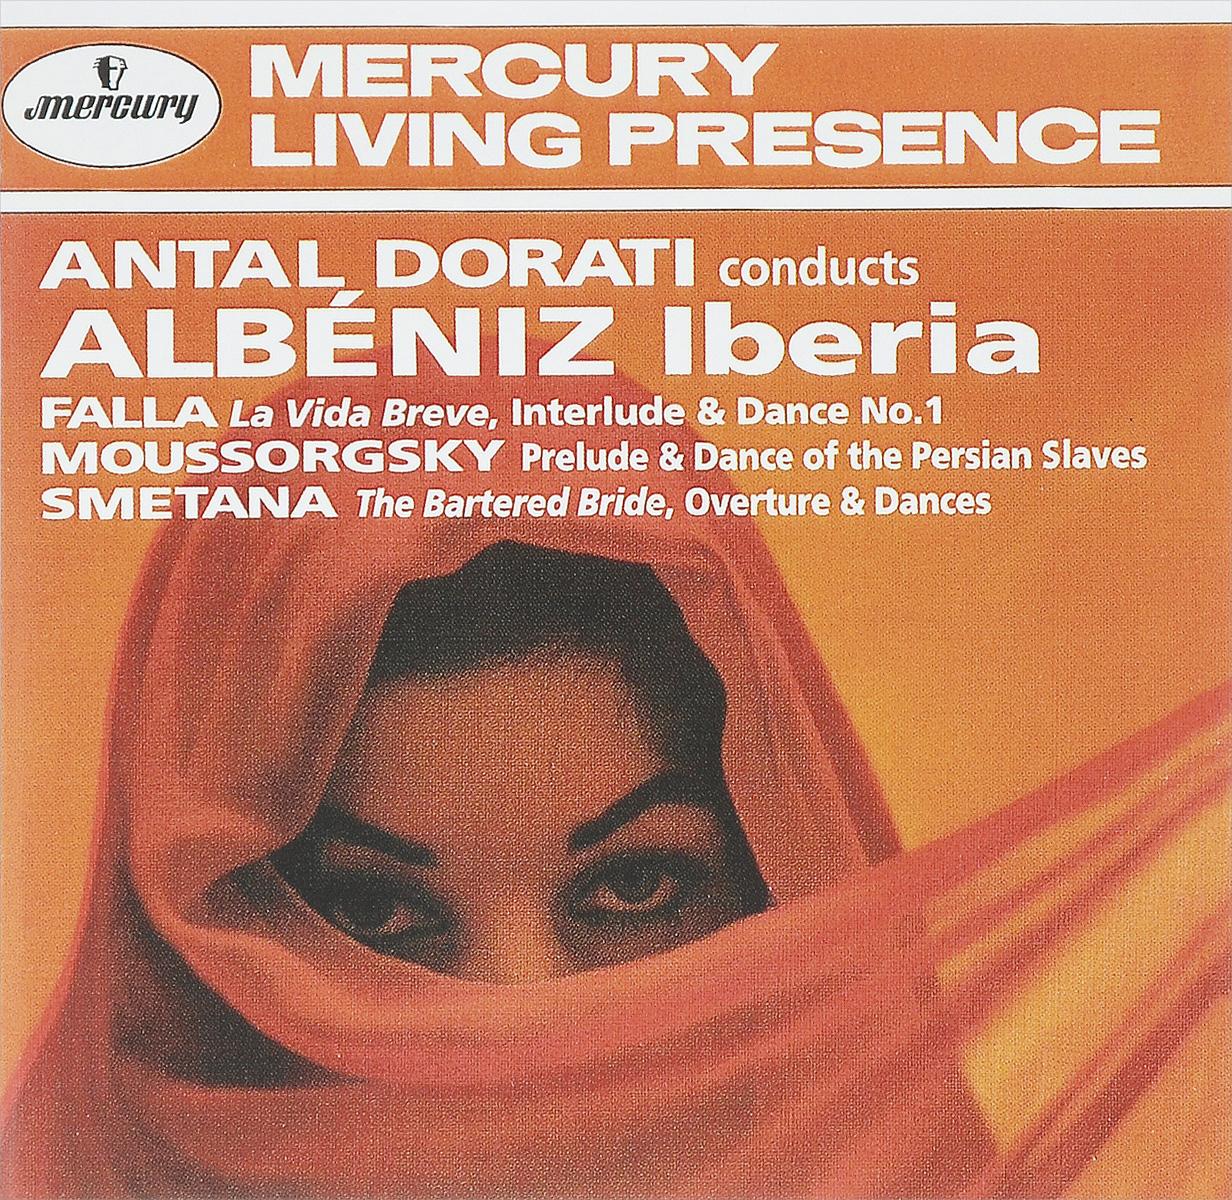 Антал Дорати,Minnesota Orchestra Antal Dorati Conducts Albeniz / Iberia / Falla / Moussorgsky / Smetana meindl minnesota gtx